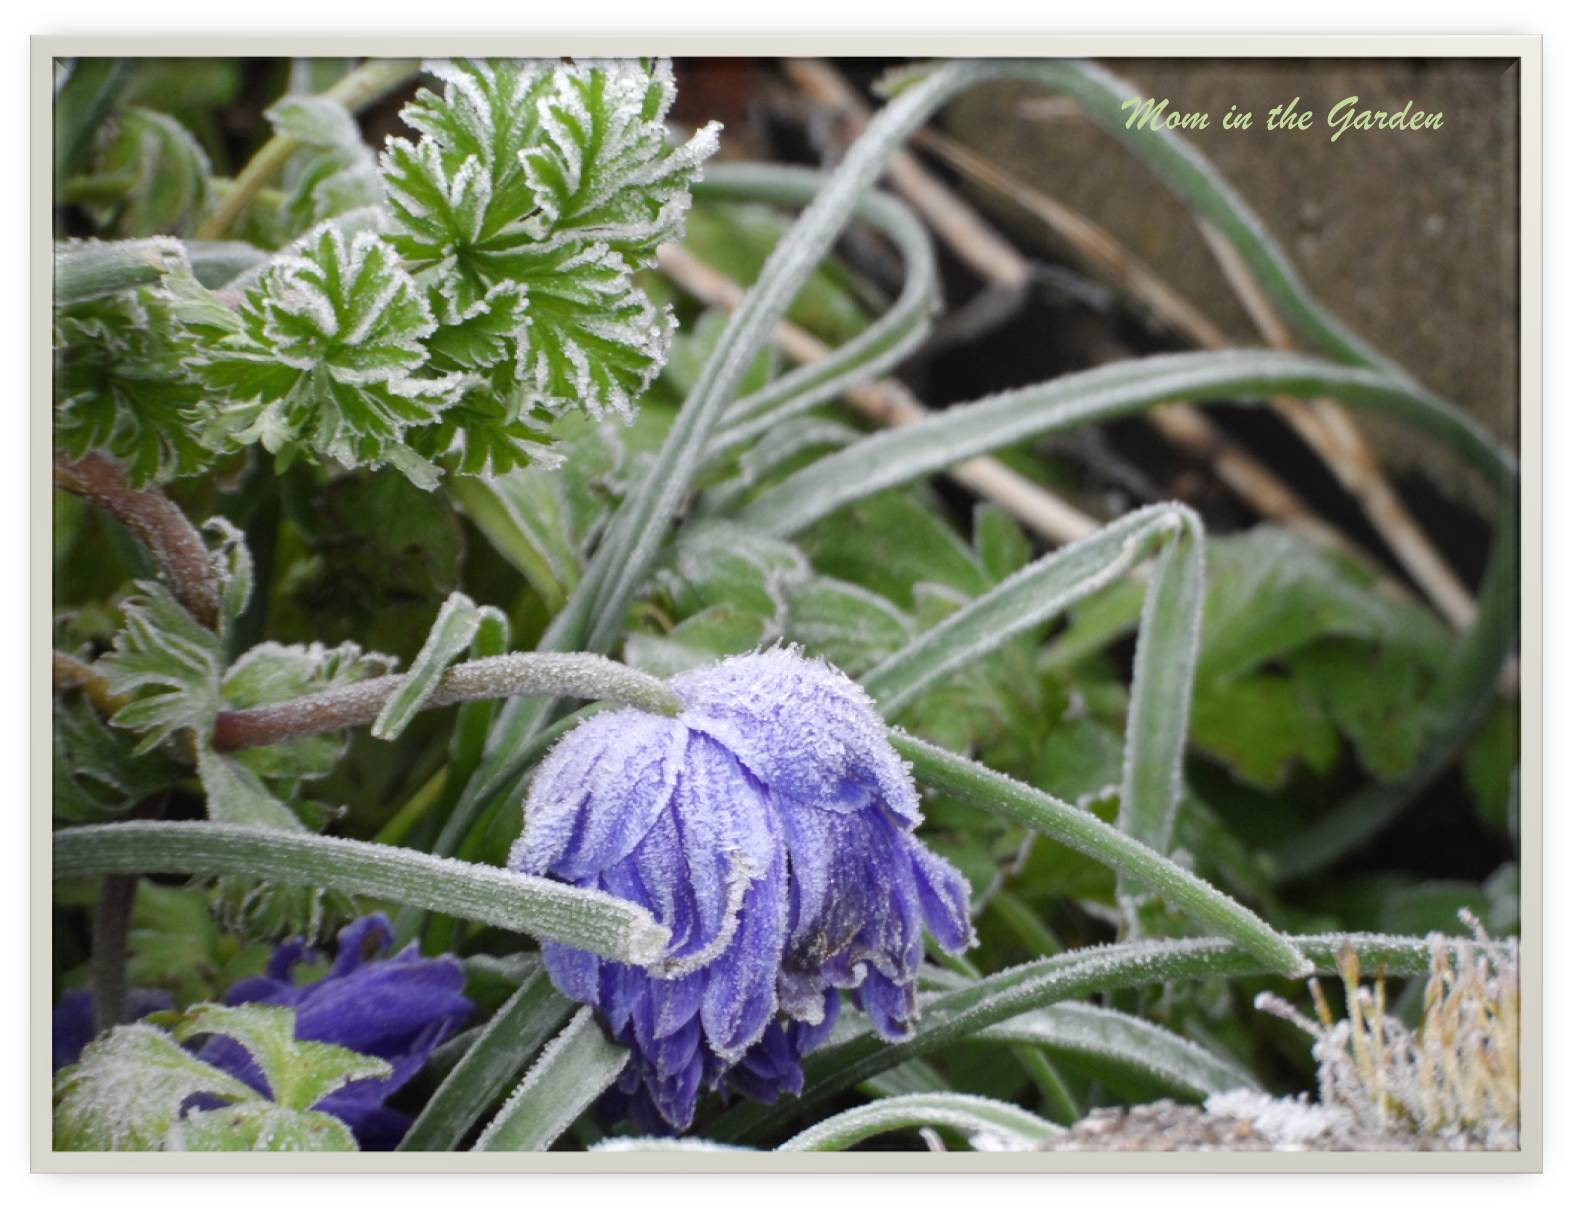 A frozen anemone